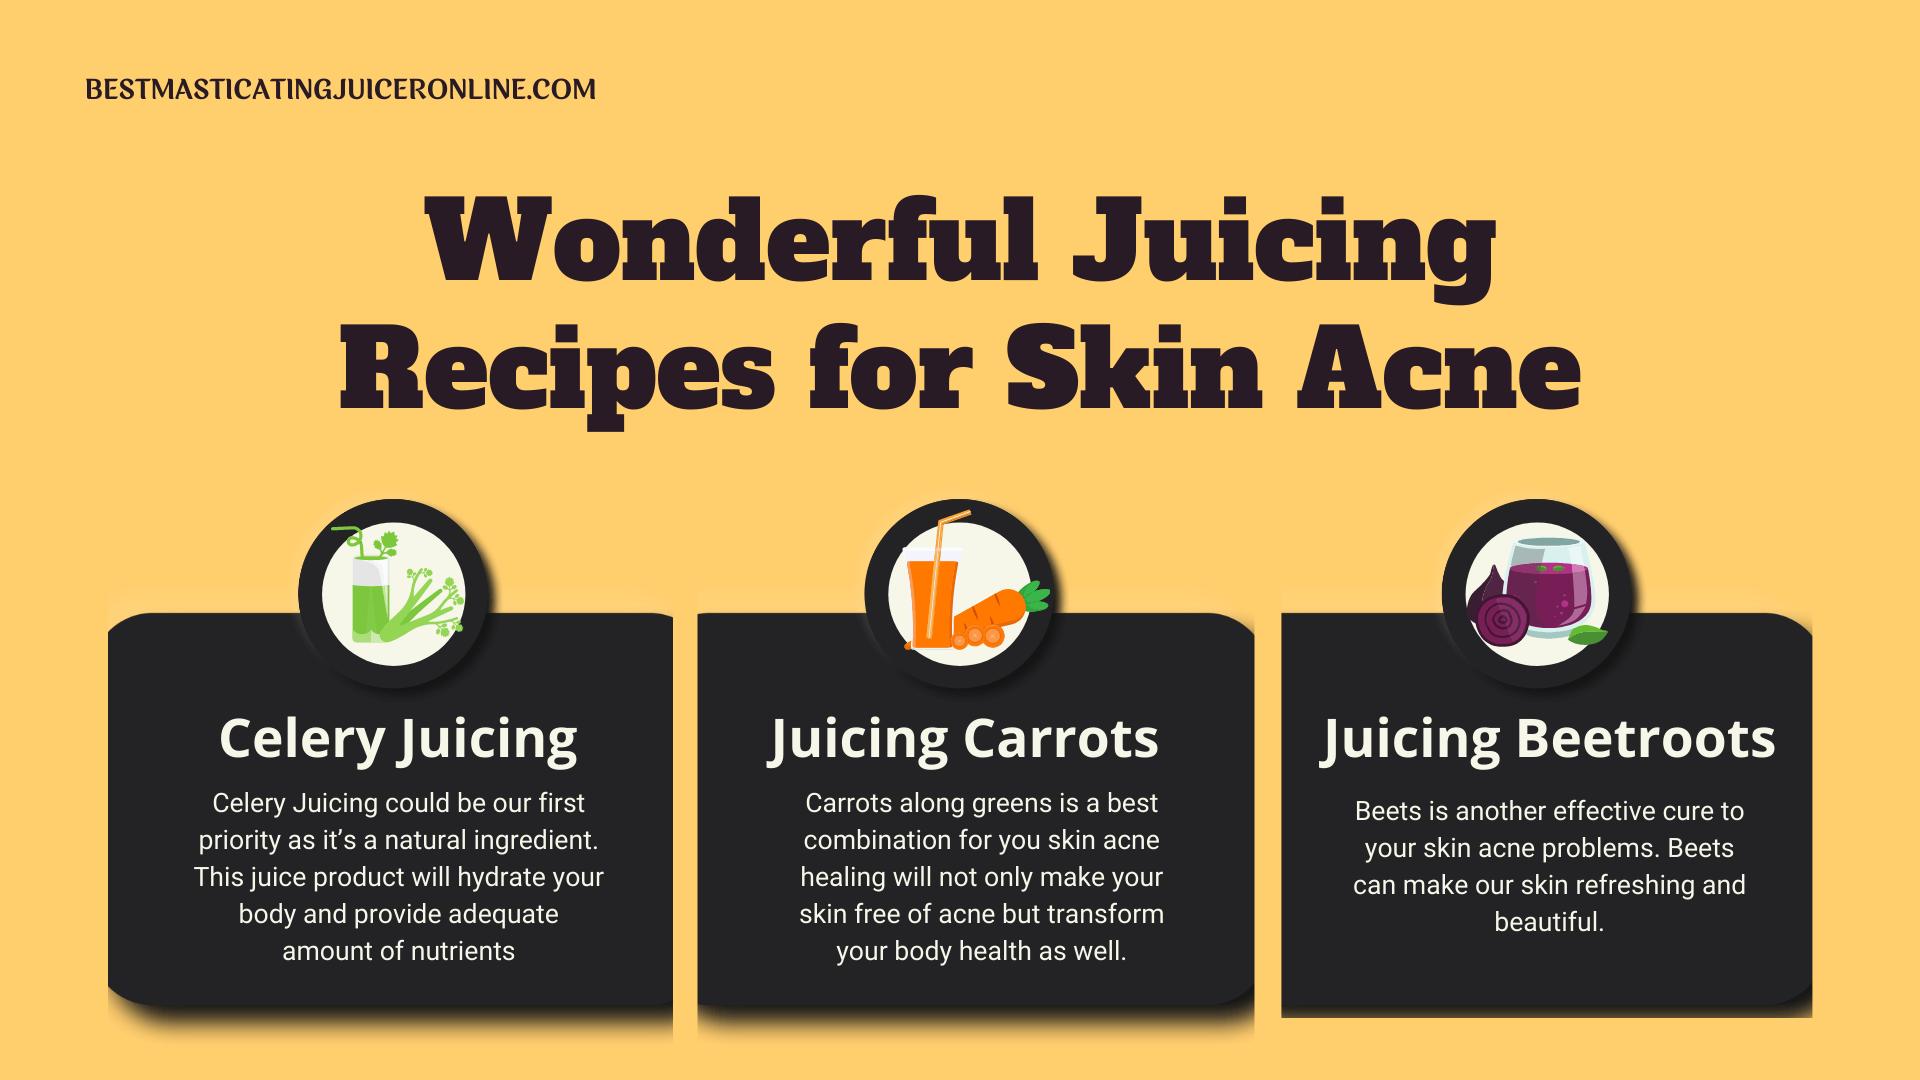 Wonderful Juicing recipes for Skin Acne